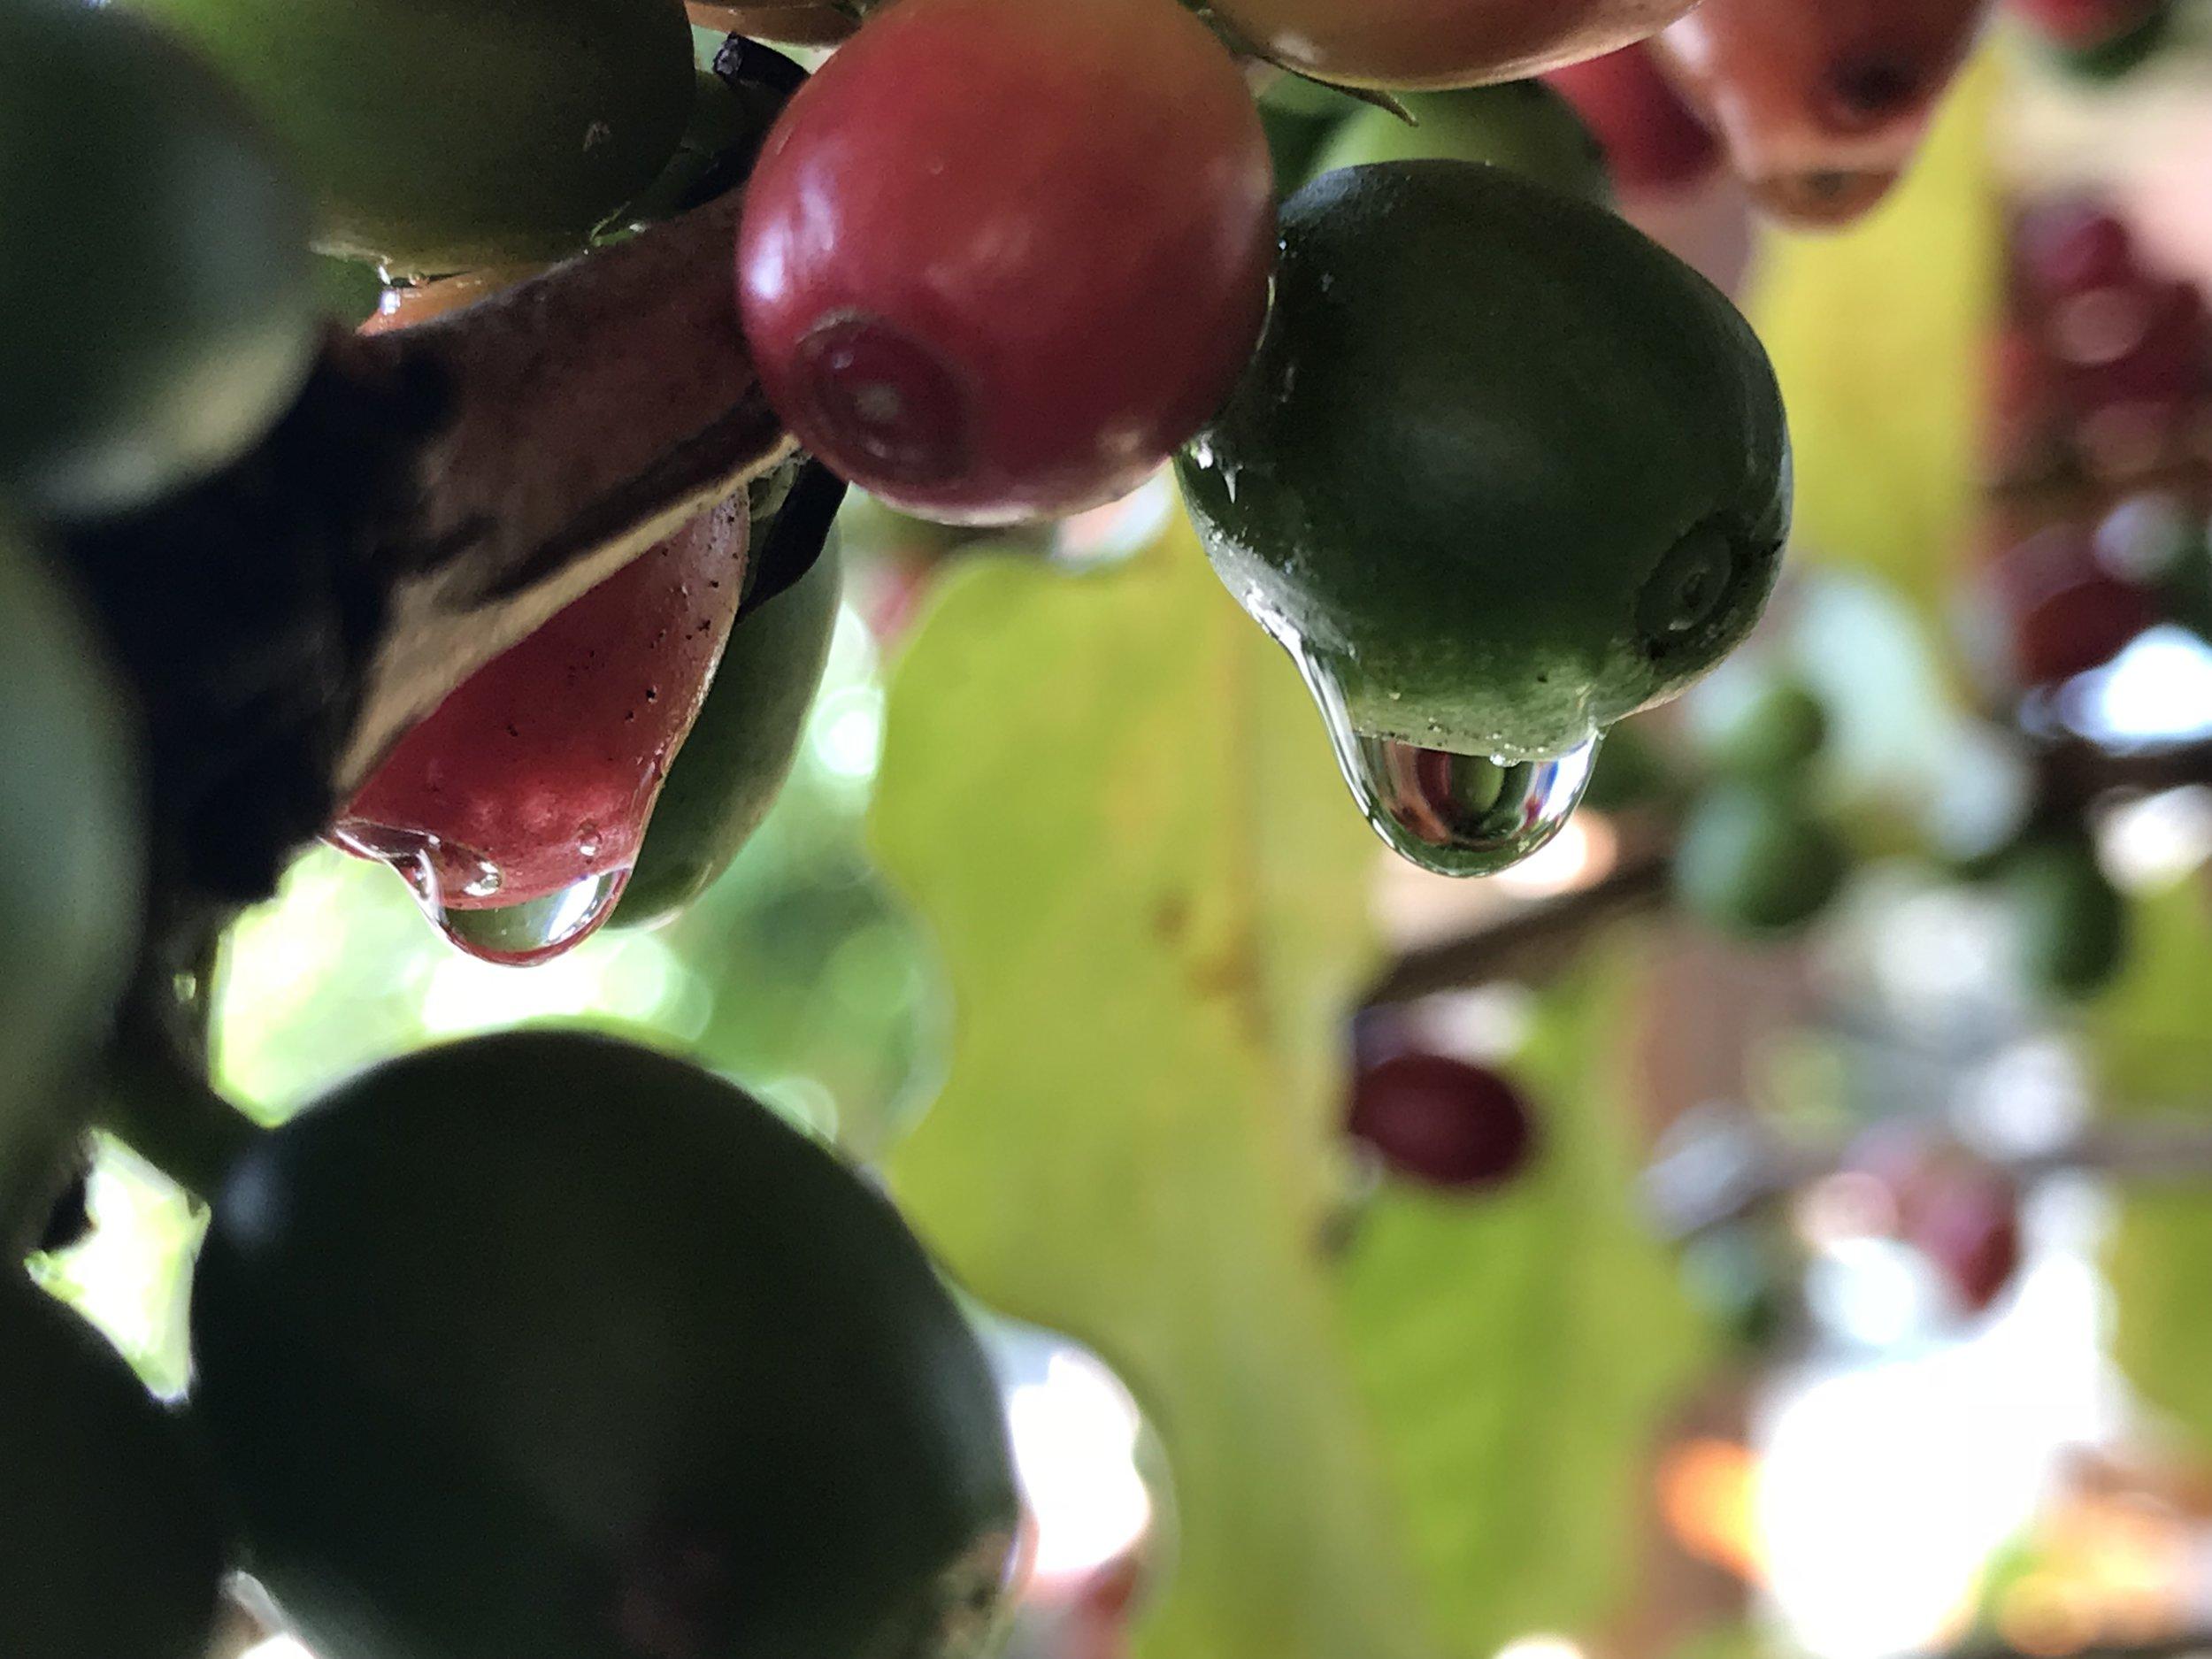 1811-Densidade_frutas.jpg